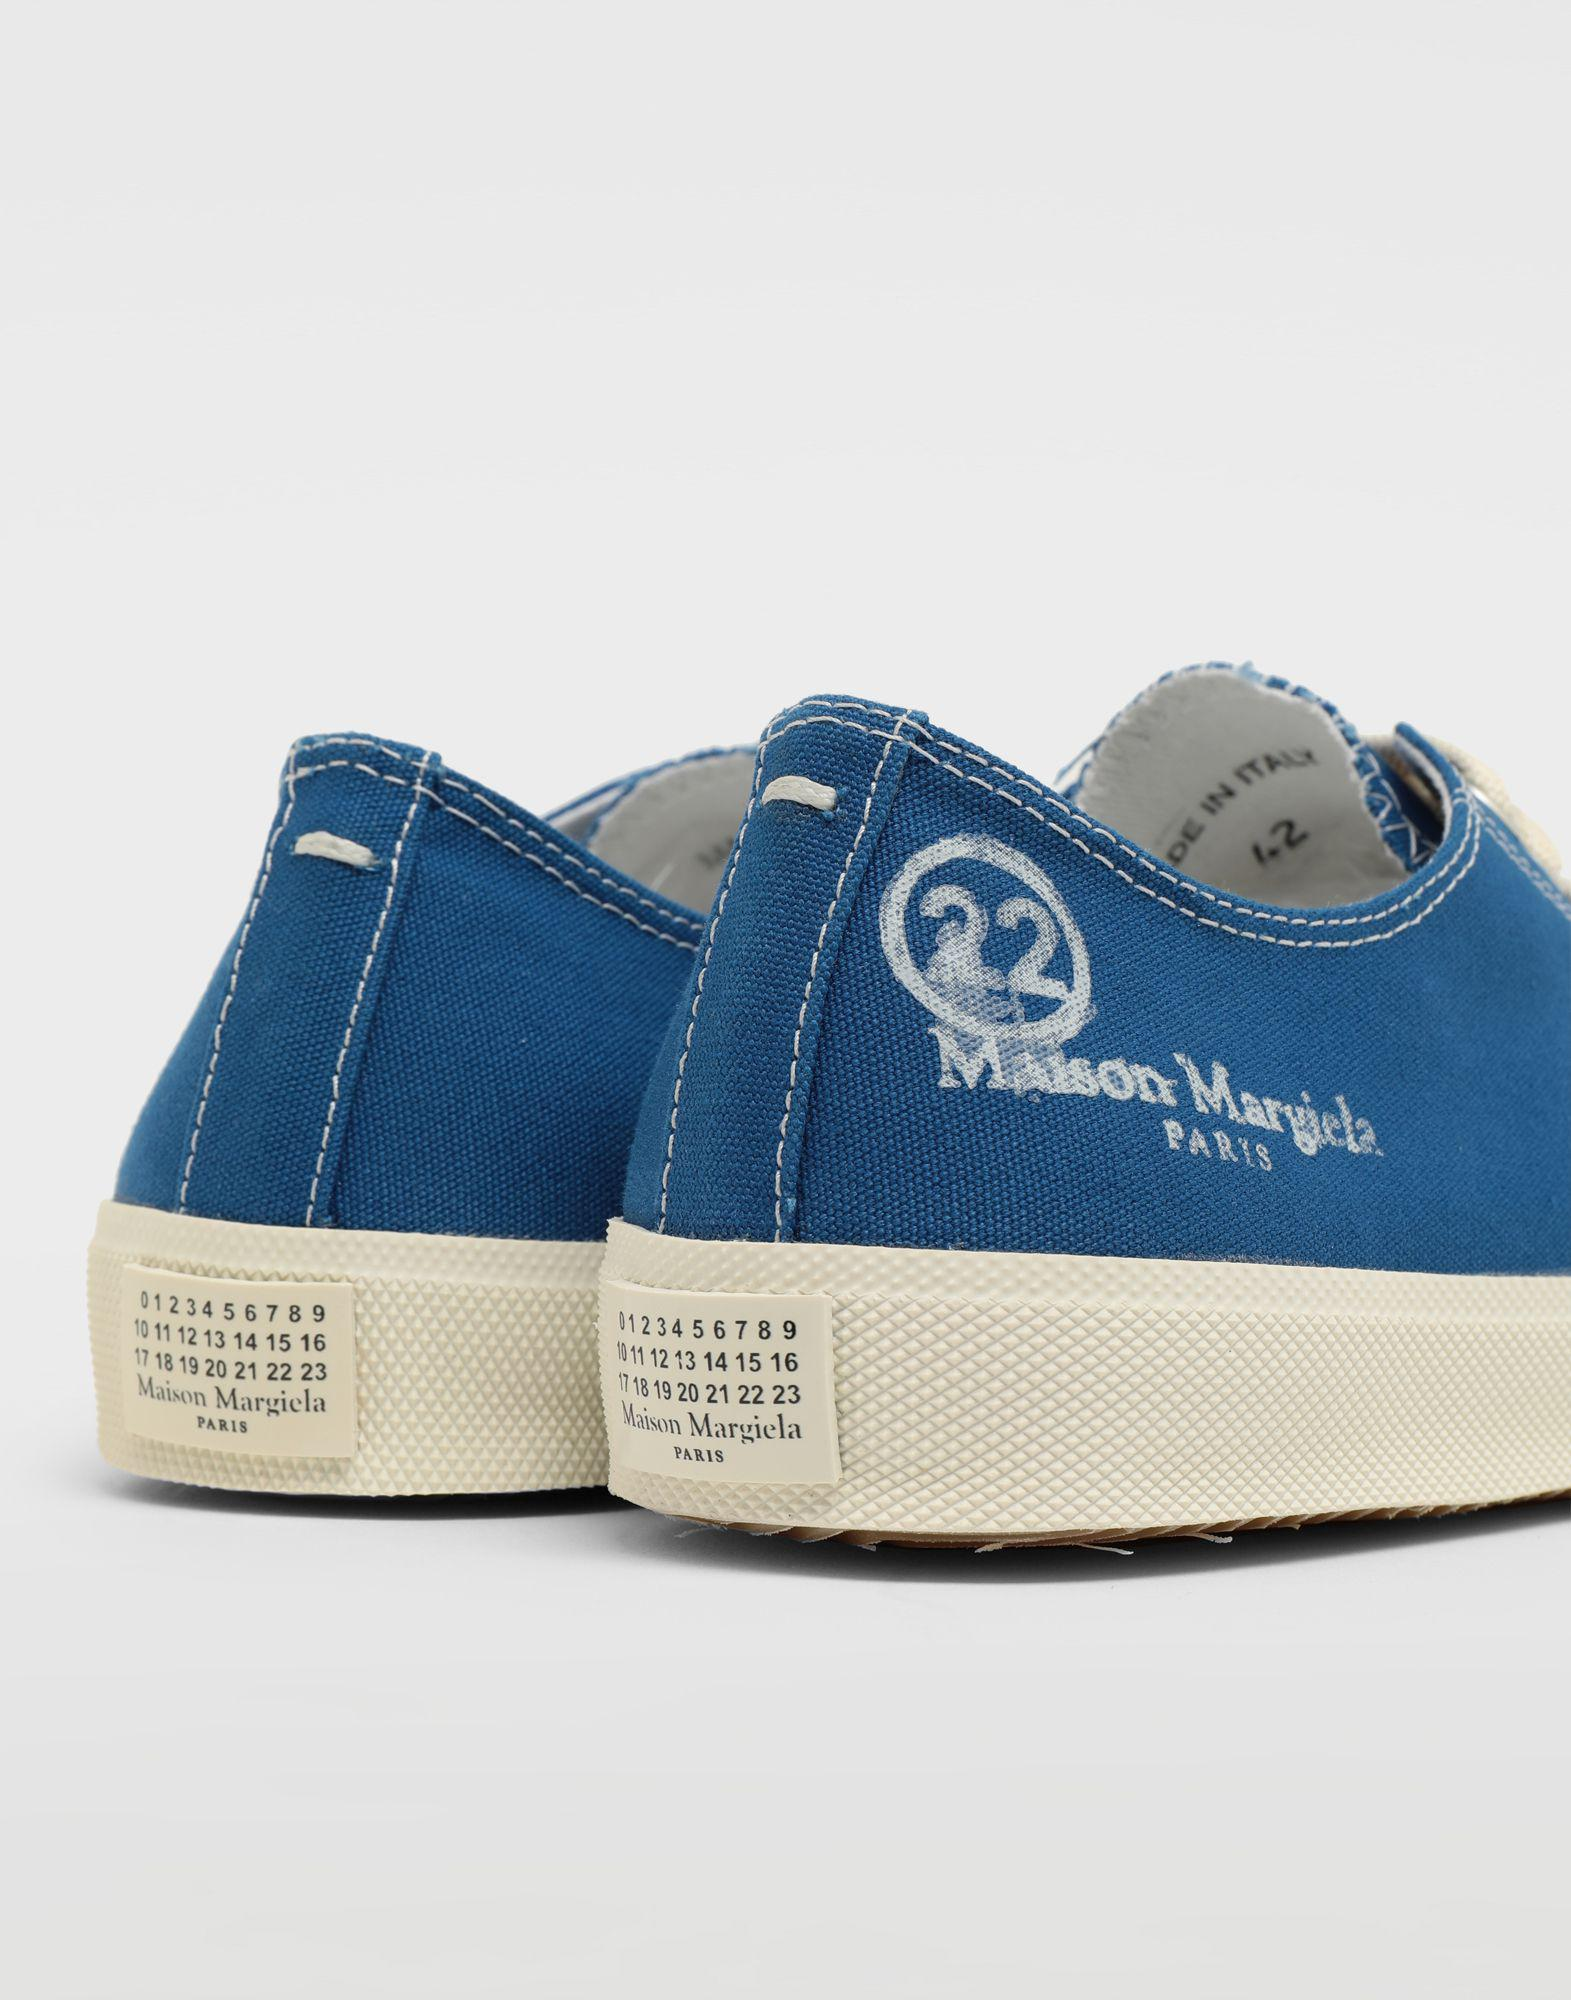 b84c2bfa7858 Maison Margiela Tabi Low Top Sneakers in Blue for Men - Save 14% - Lyst